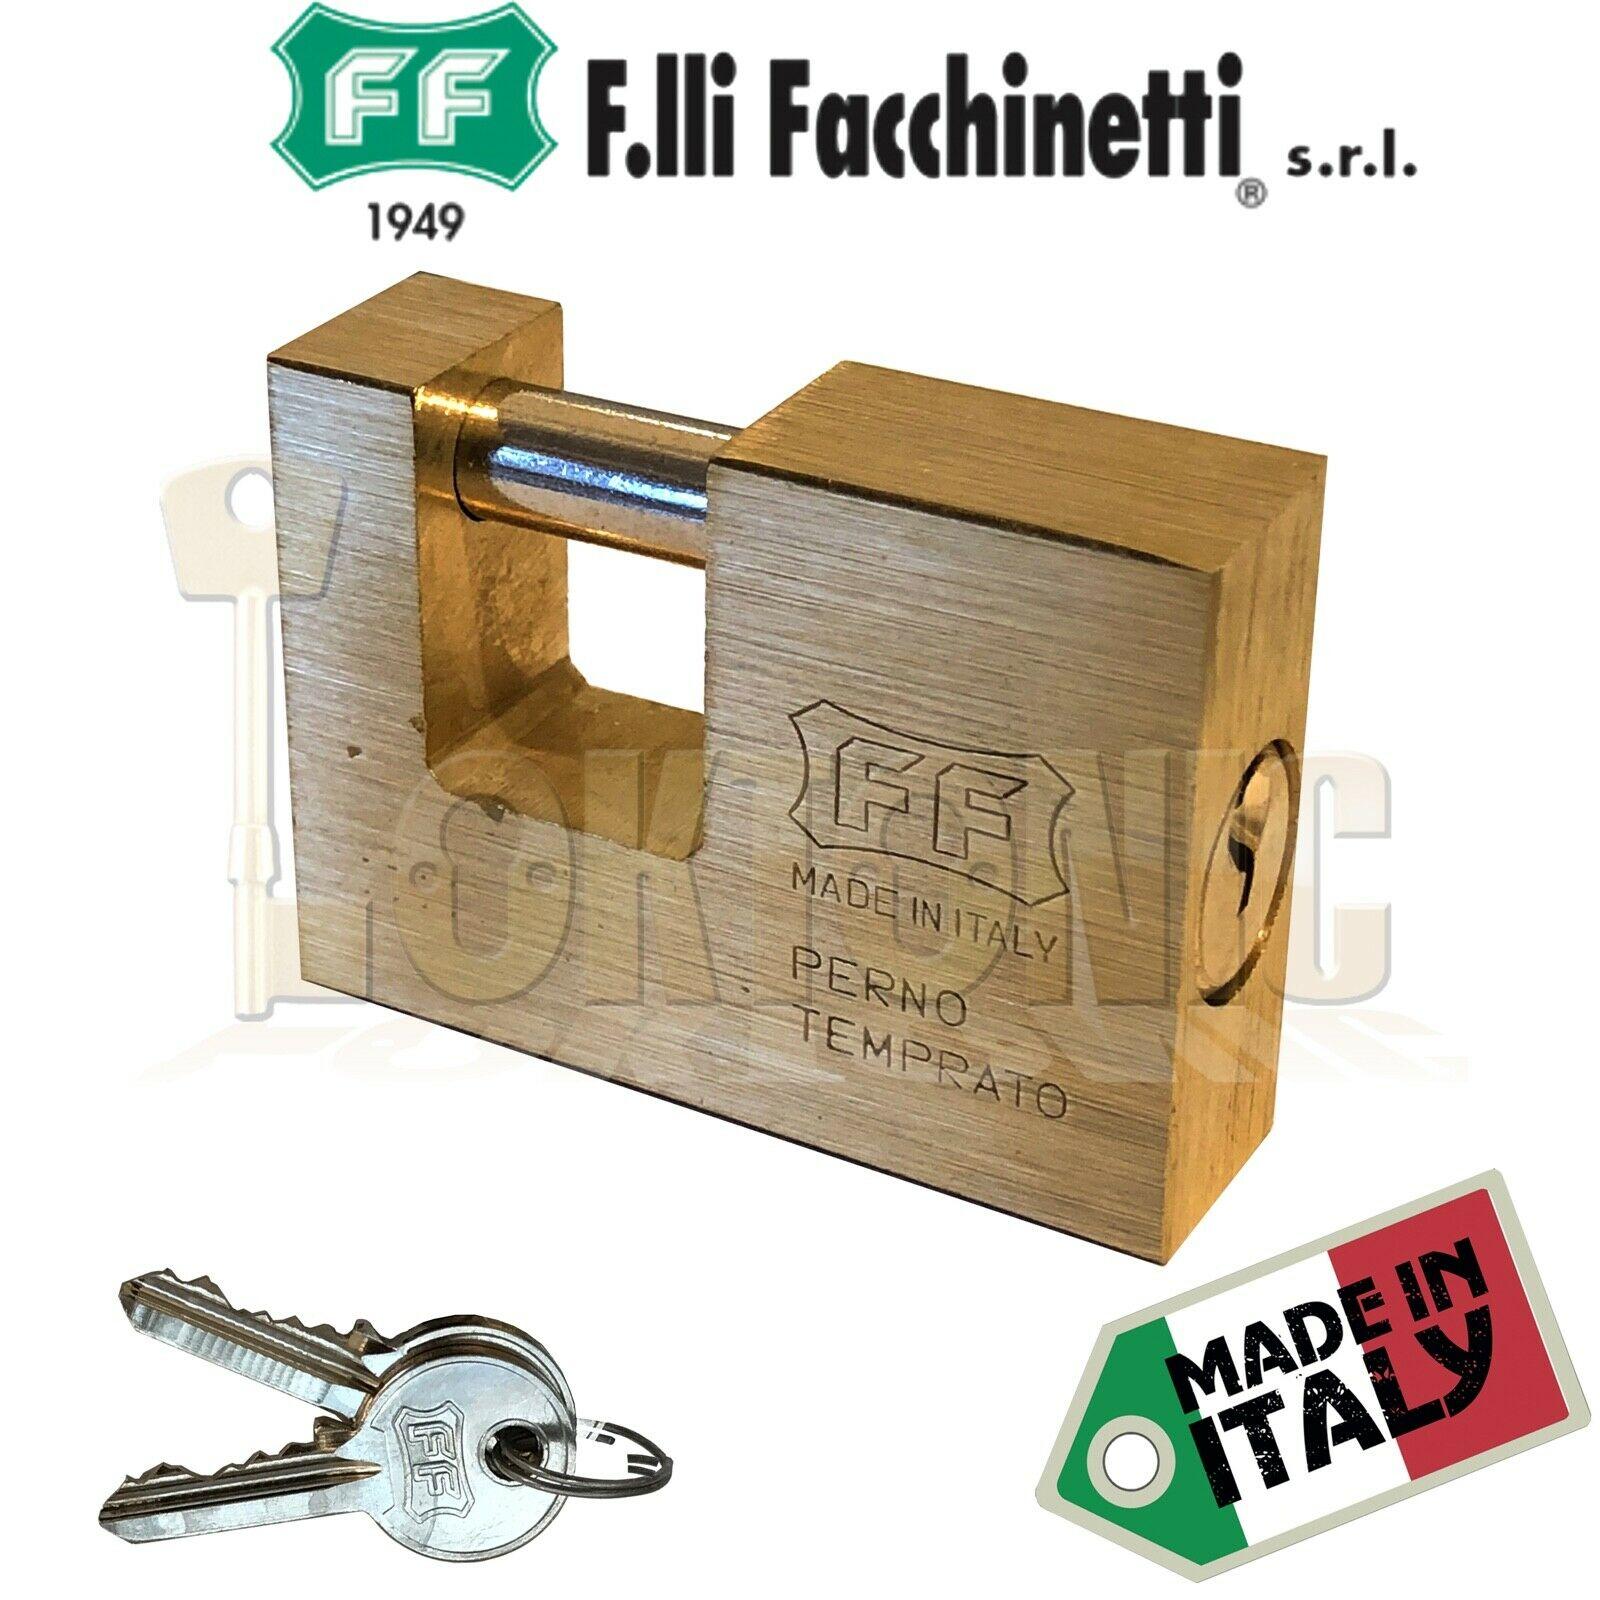 Facchinetti Solid Rectangular Brass 56mm Block Lock Shutter Shed Van Padlock